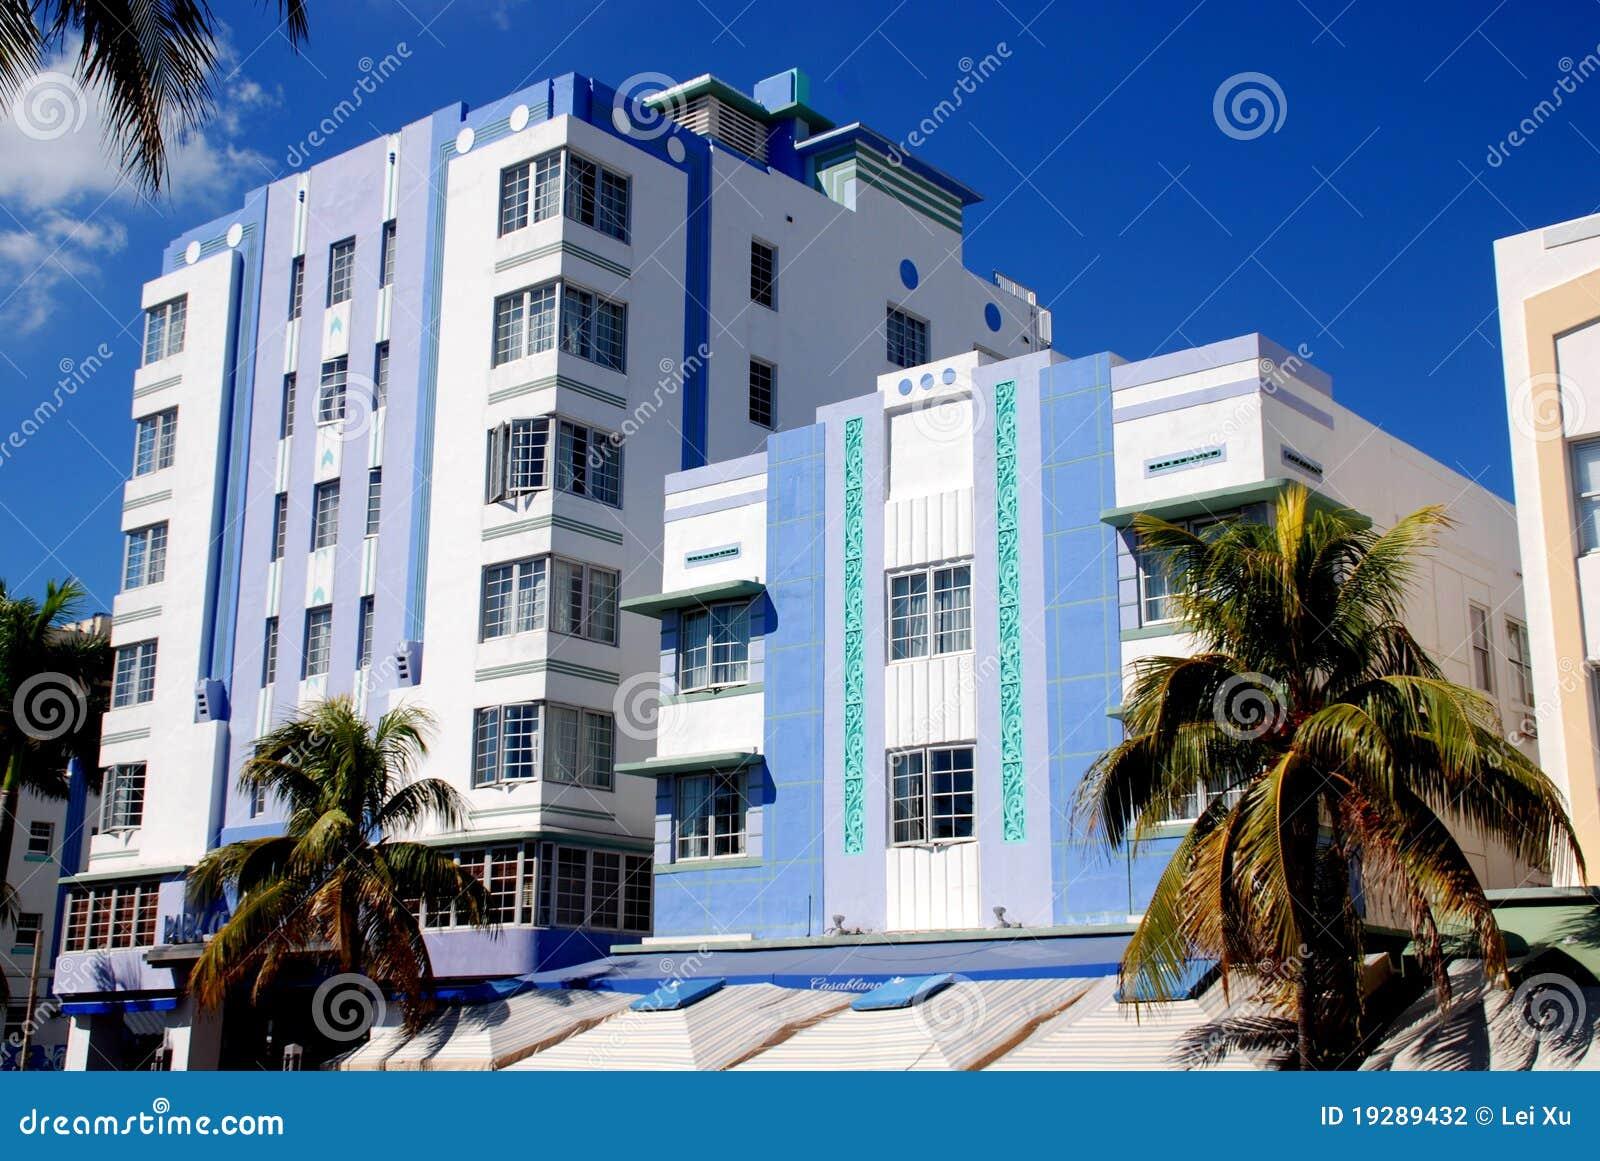 Miami south beach dating